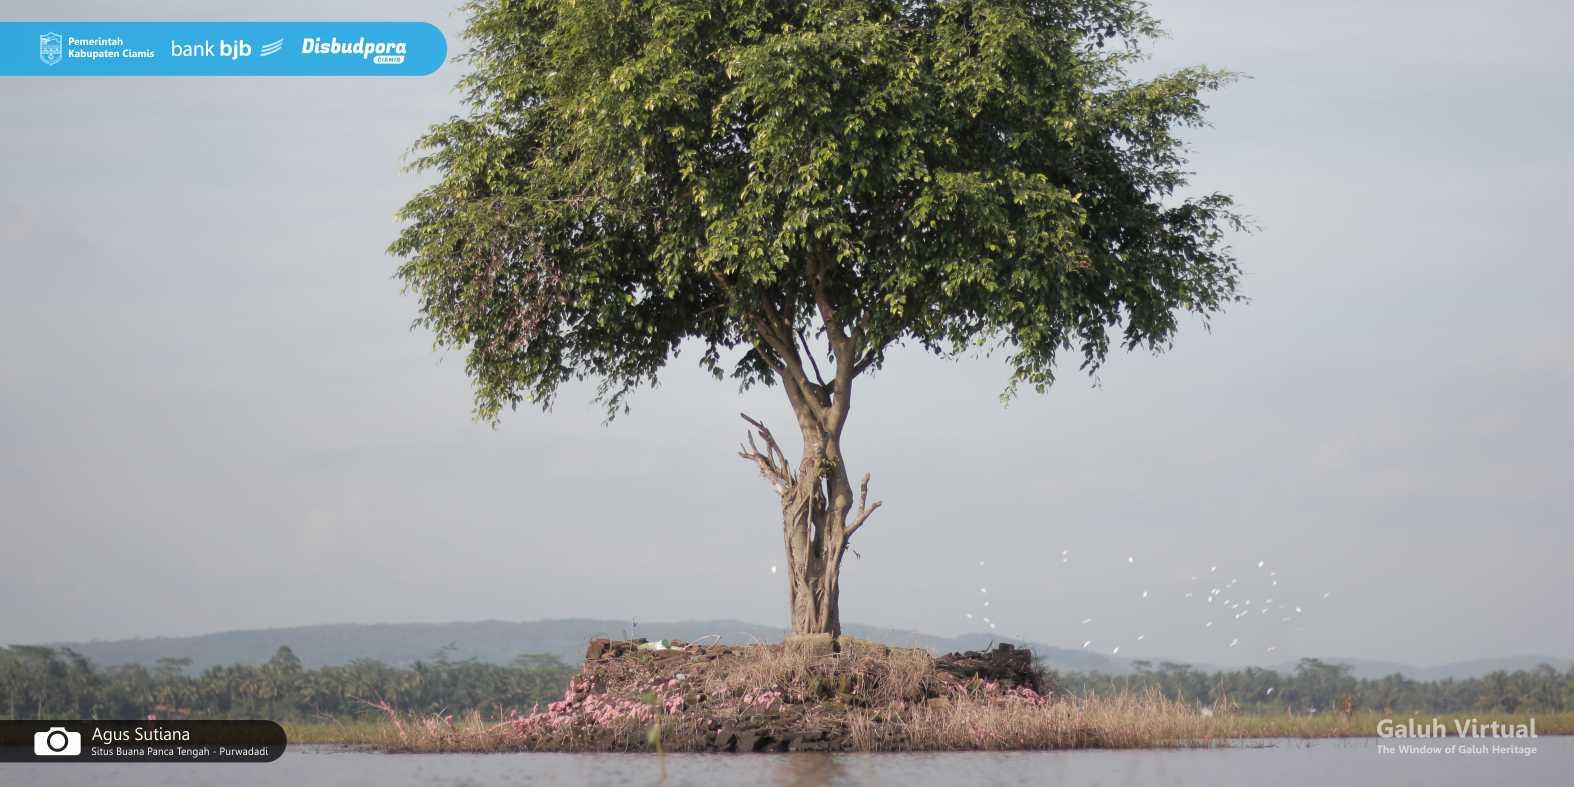 Situs Buana Pancatengah - Purwadadi